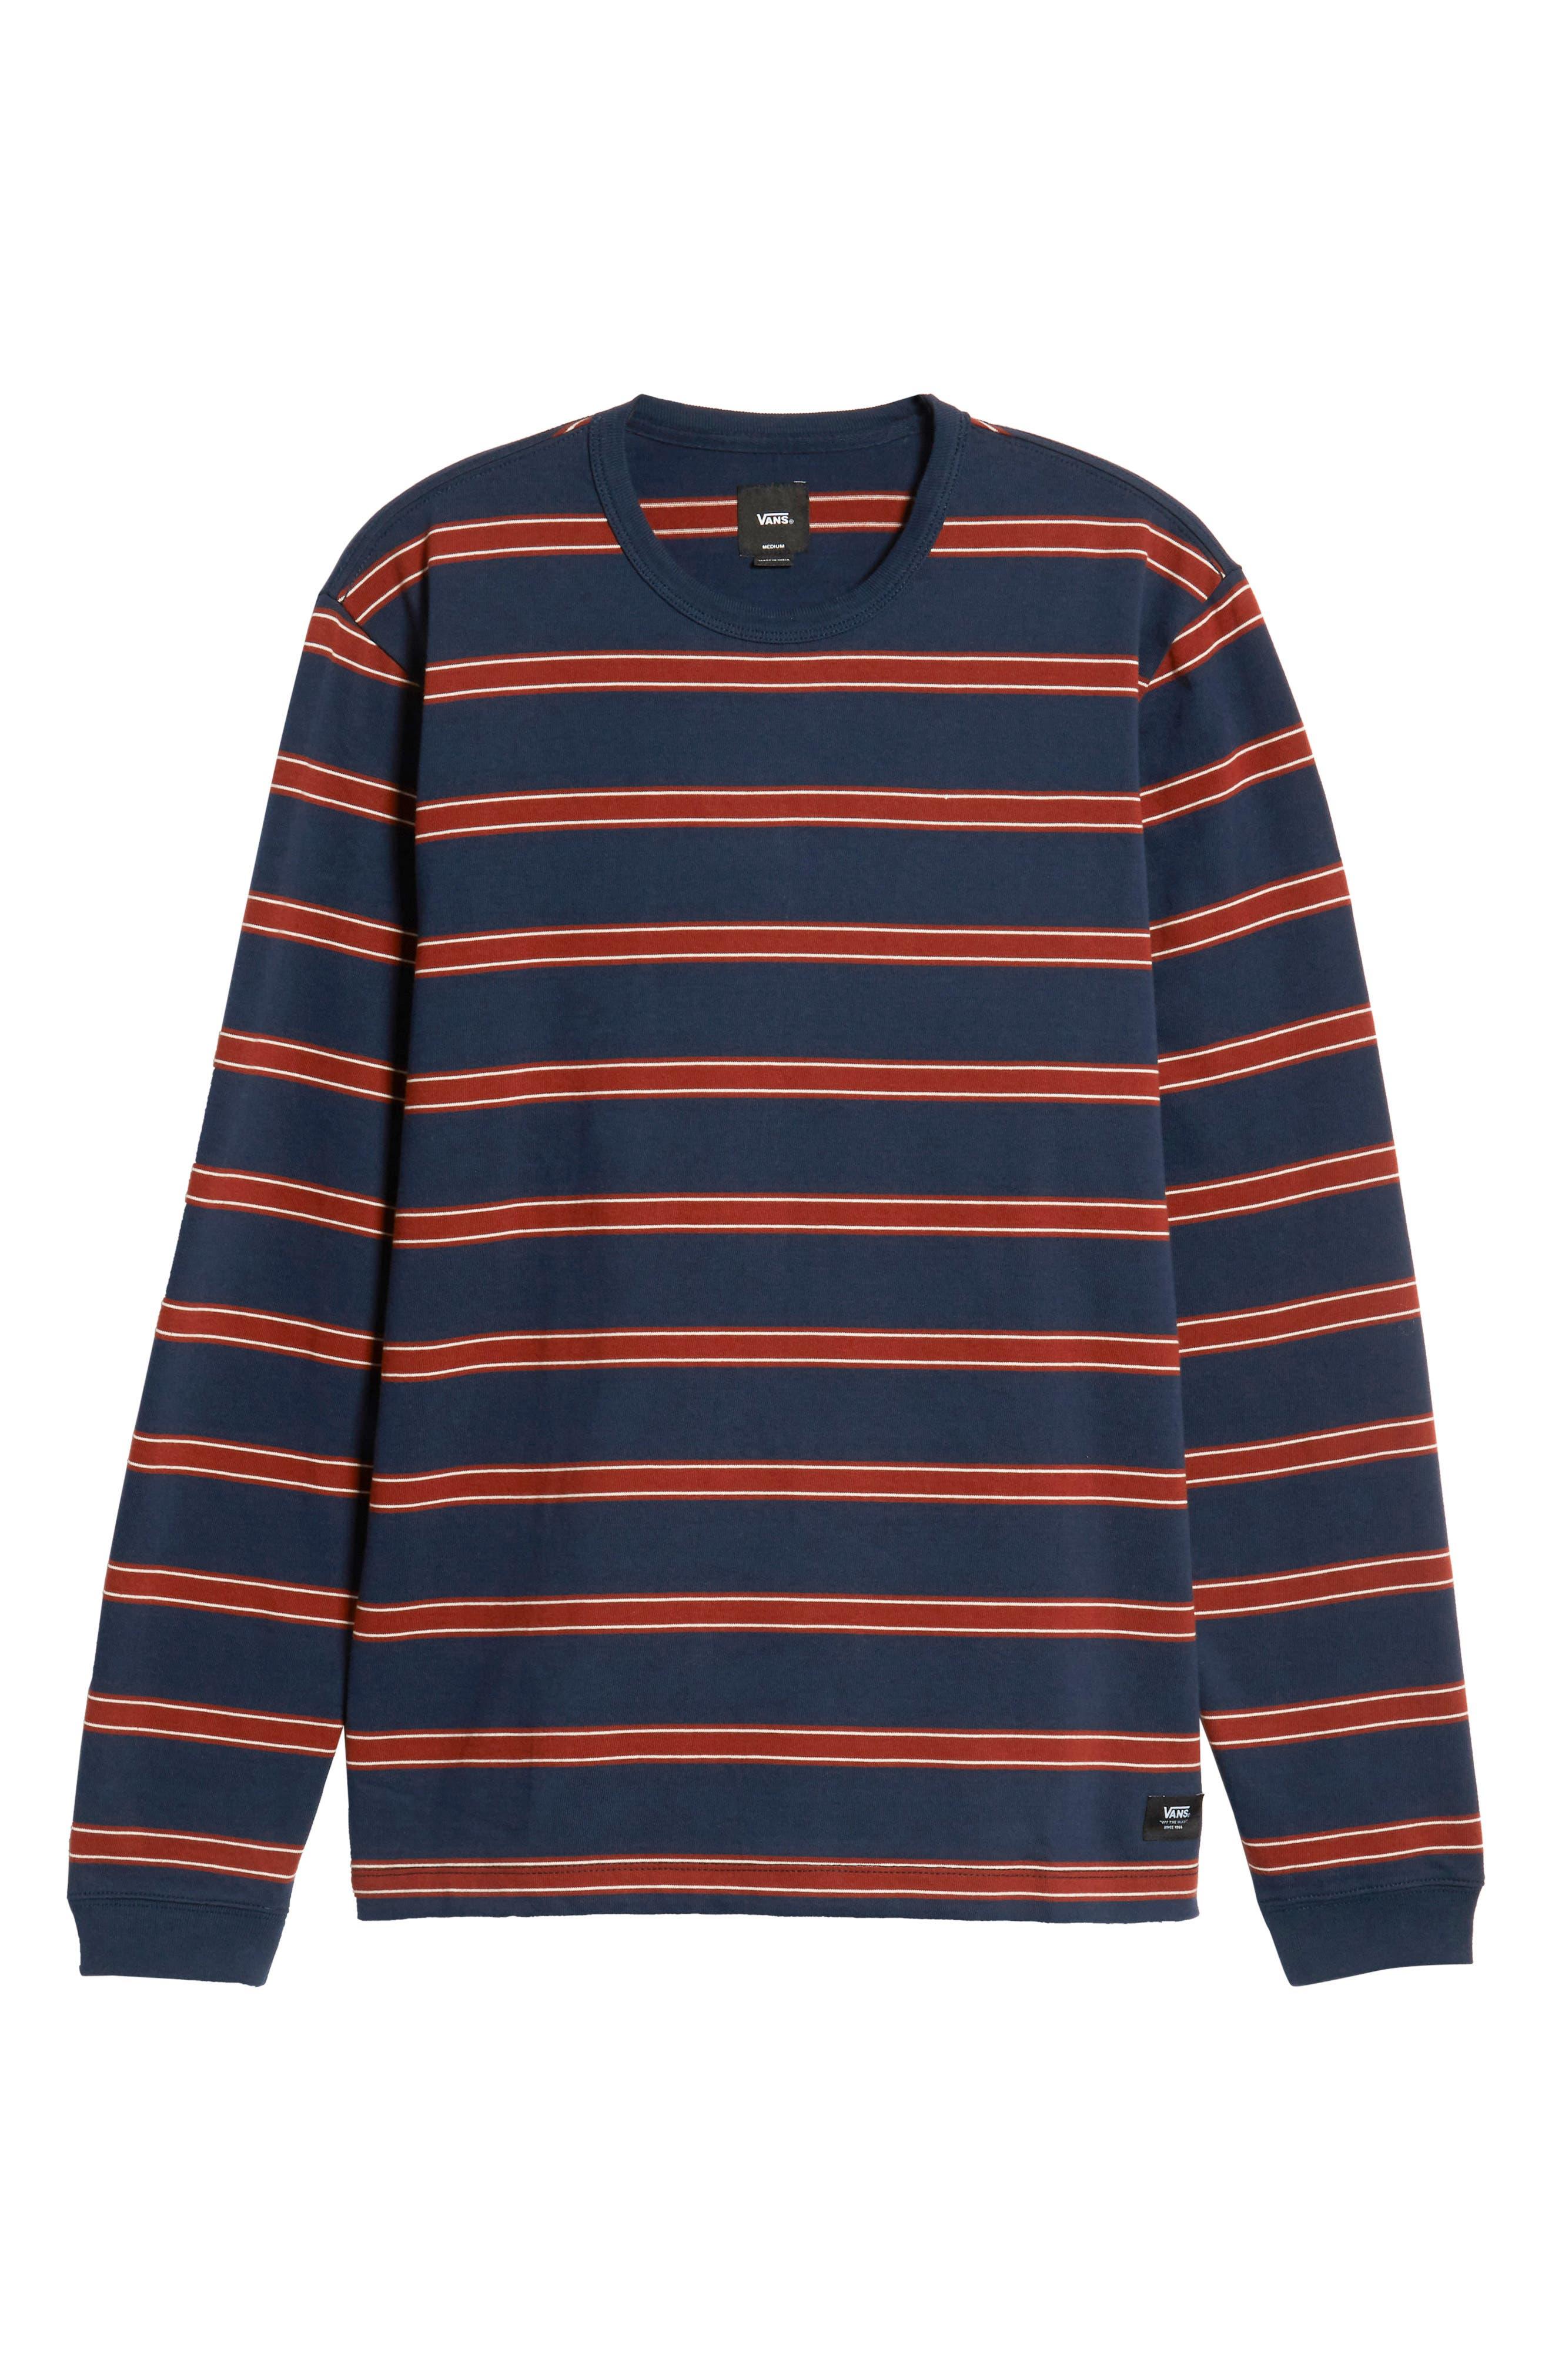 Watson Striped Long Sleeve T-Shirt,                             Alternate thumbnail 6, color,                             DRESS BLUES